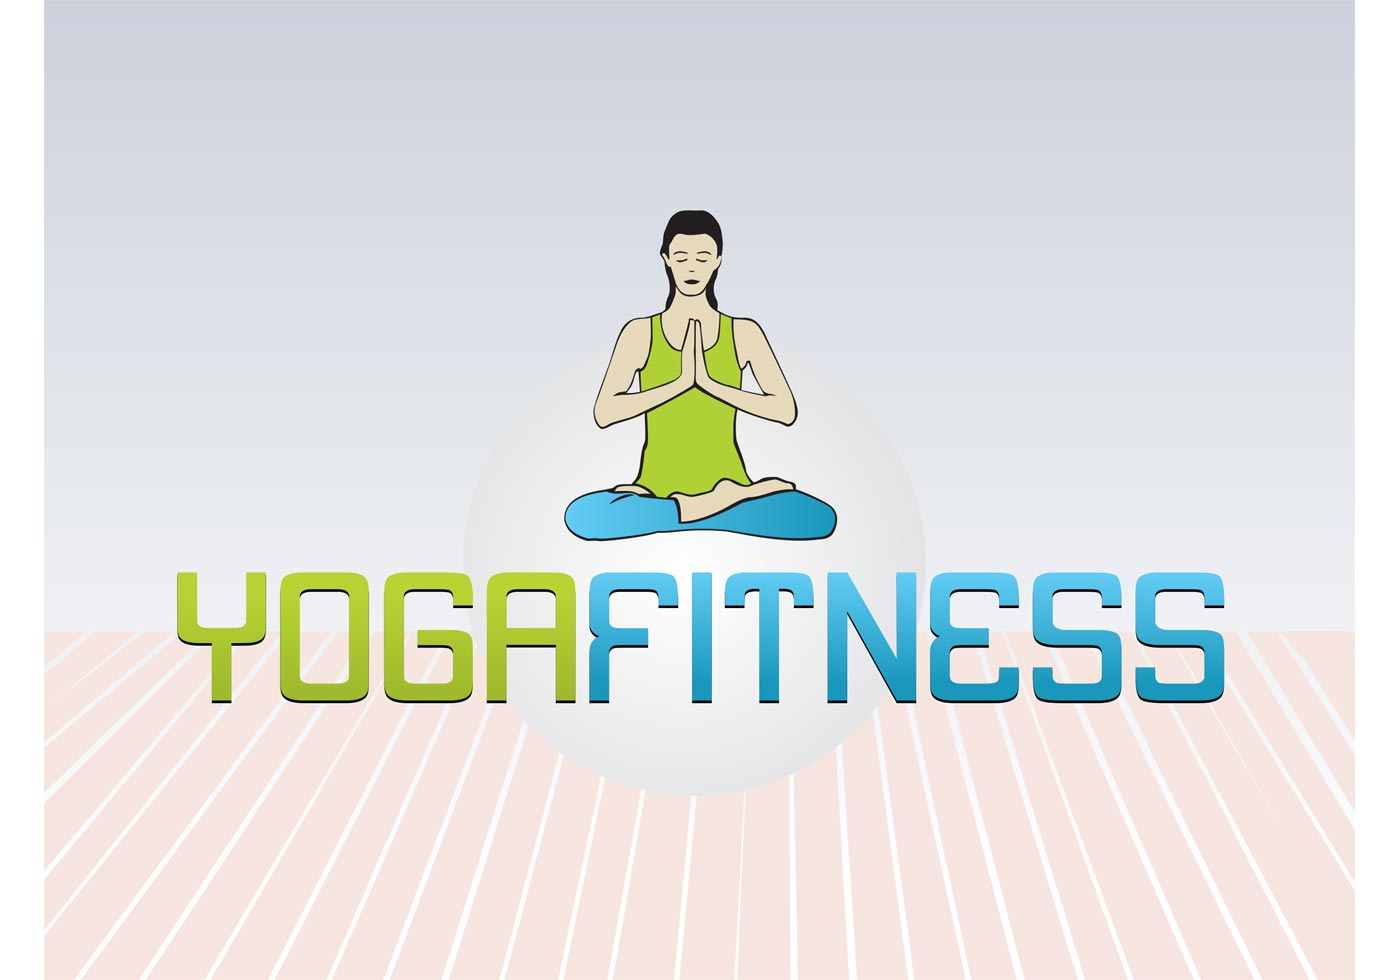 Yoga Logo - Kostenlose Vektor-Kunst, Archiv-Grafiken & Bilder ...